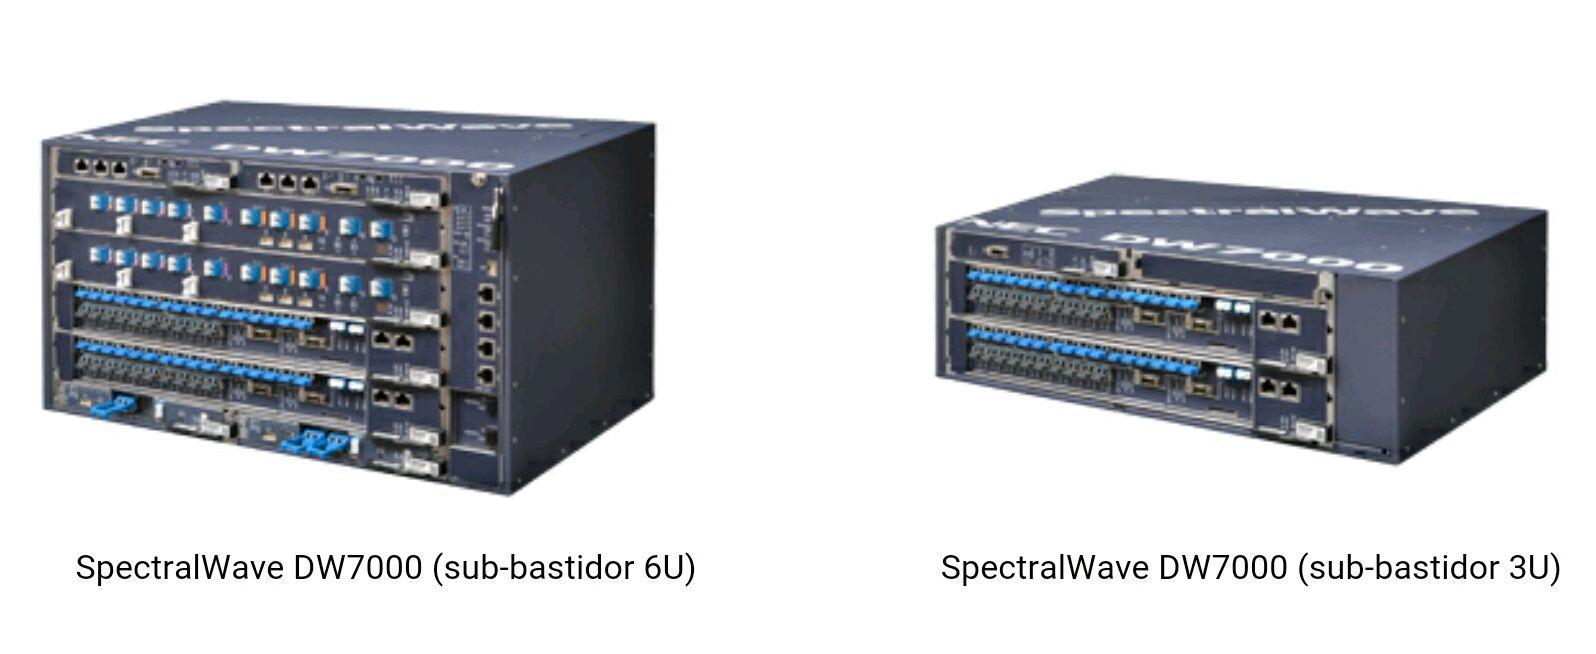 série SpectralWave DW7000